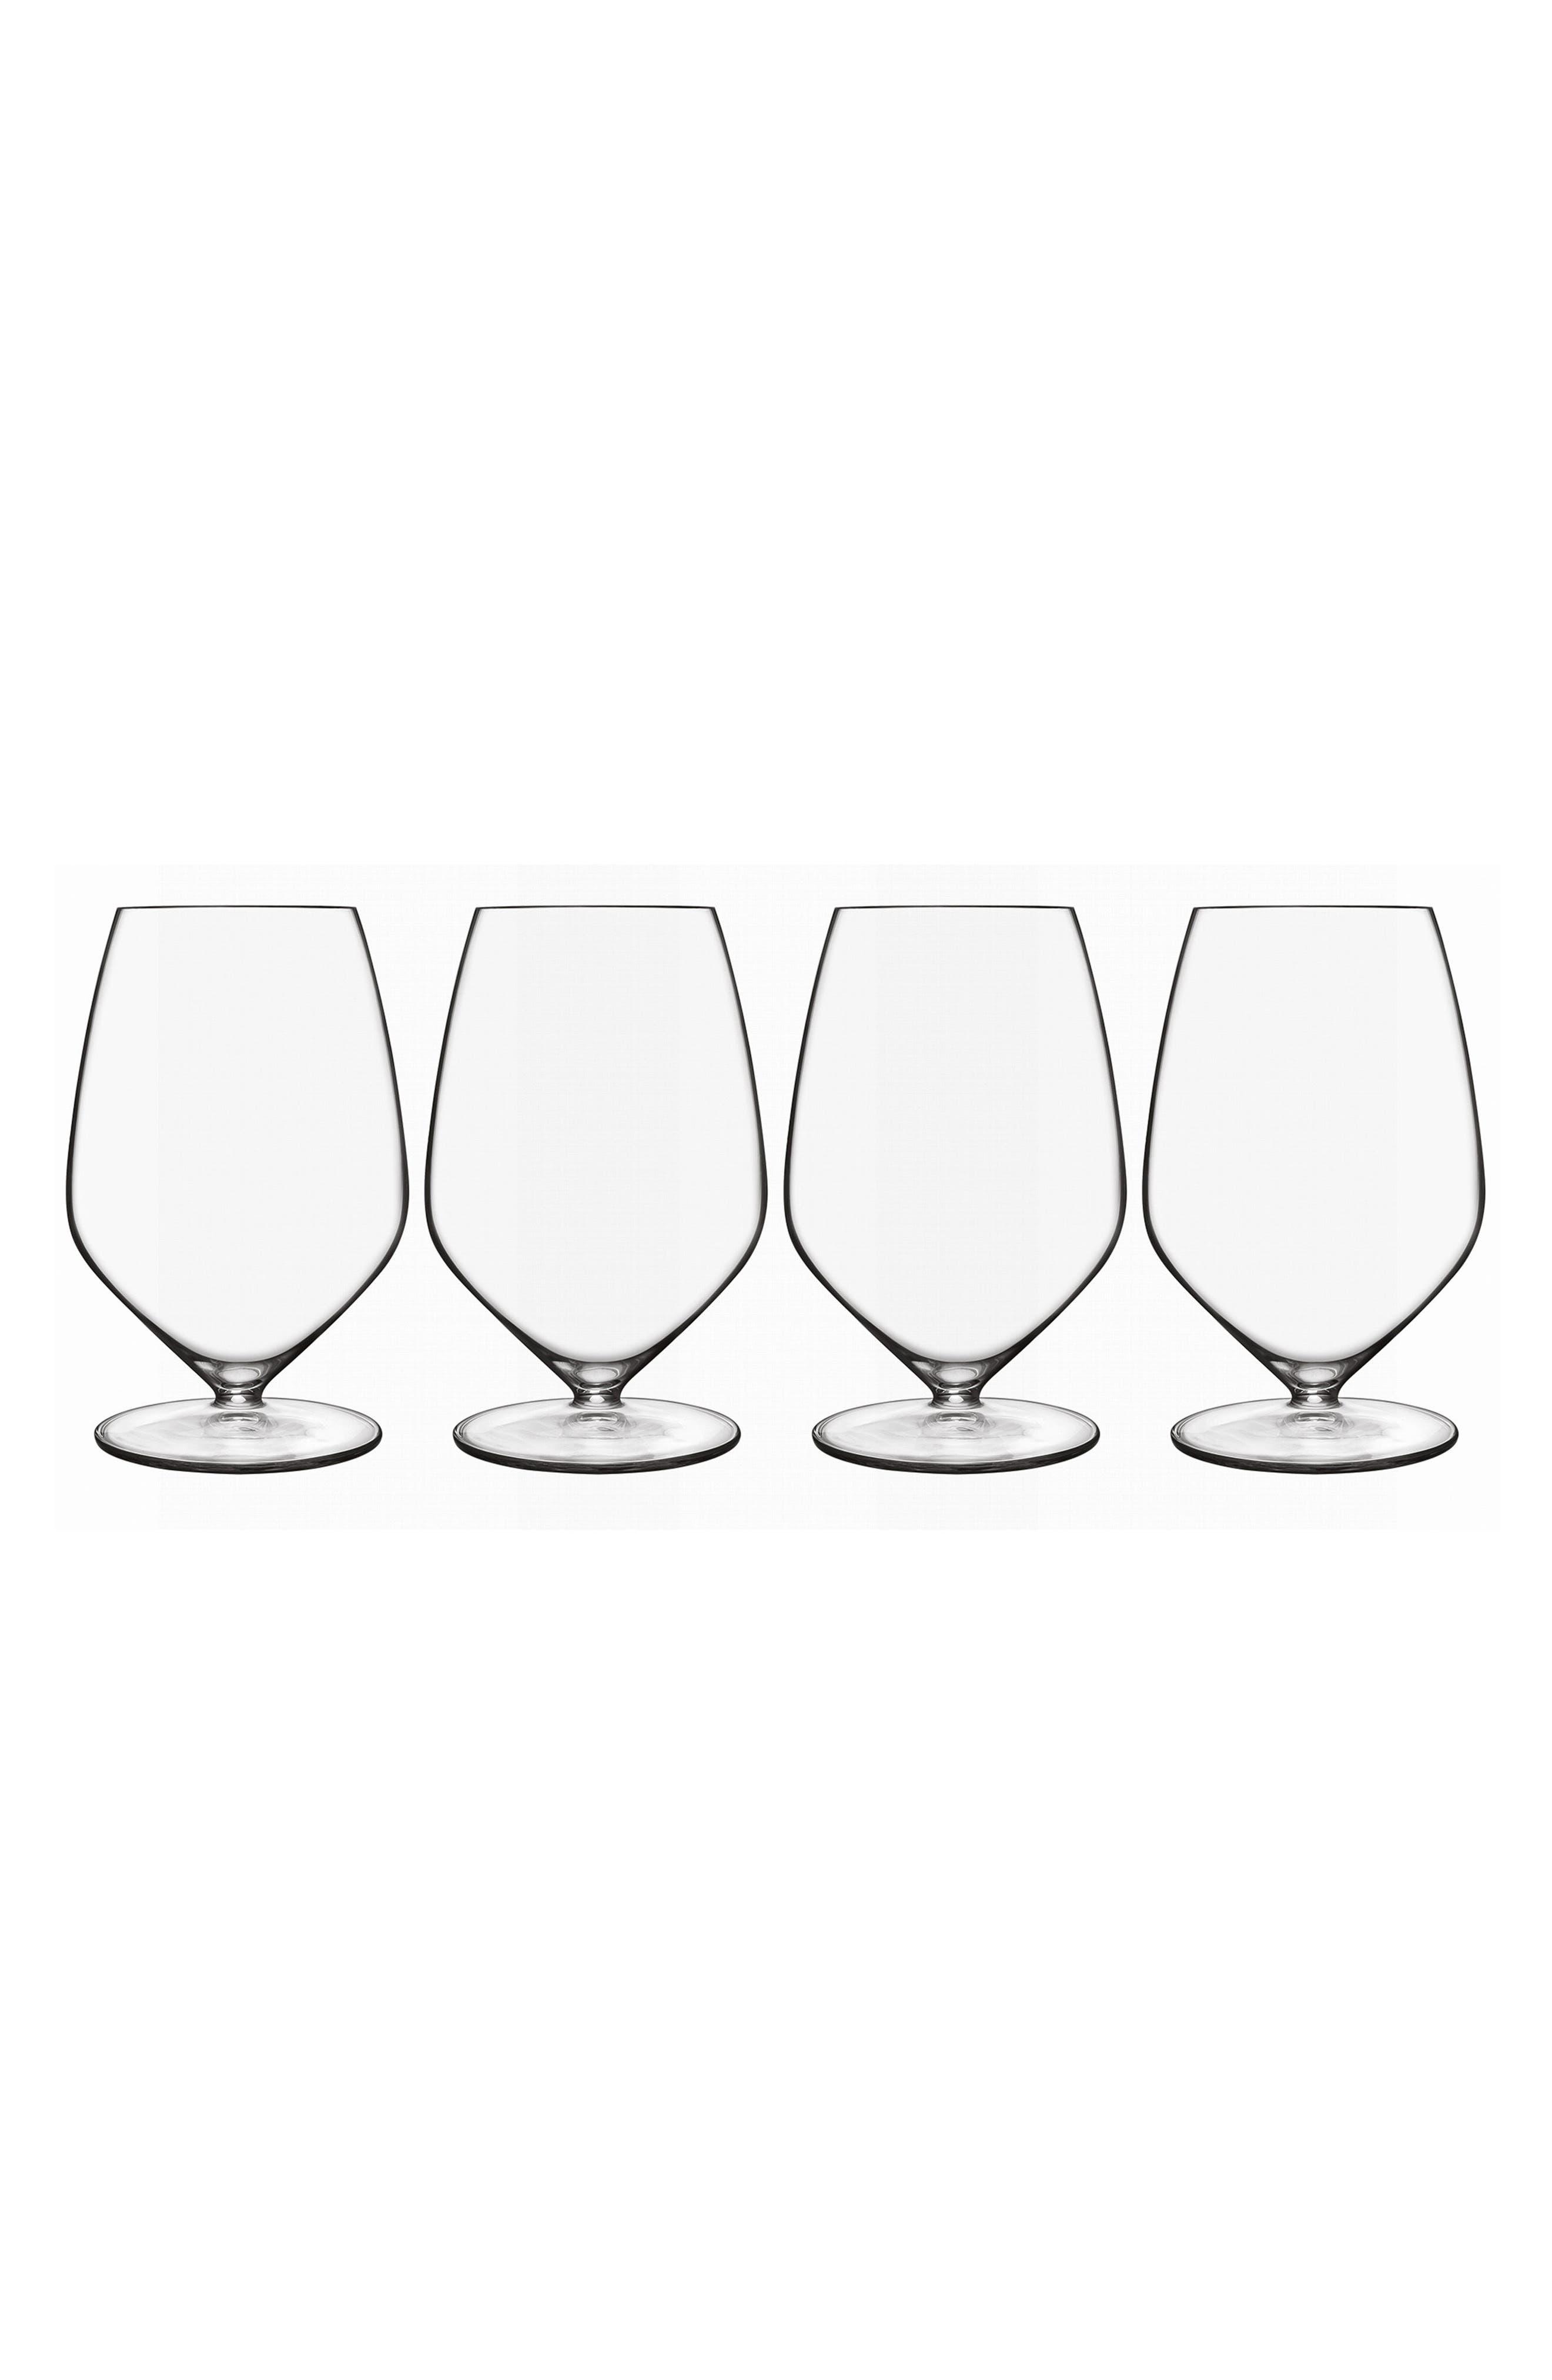 T-Glass Set of 4 Cabernet/Merlot Glasses,                         Main,                         color, Clear